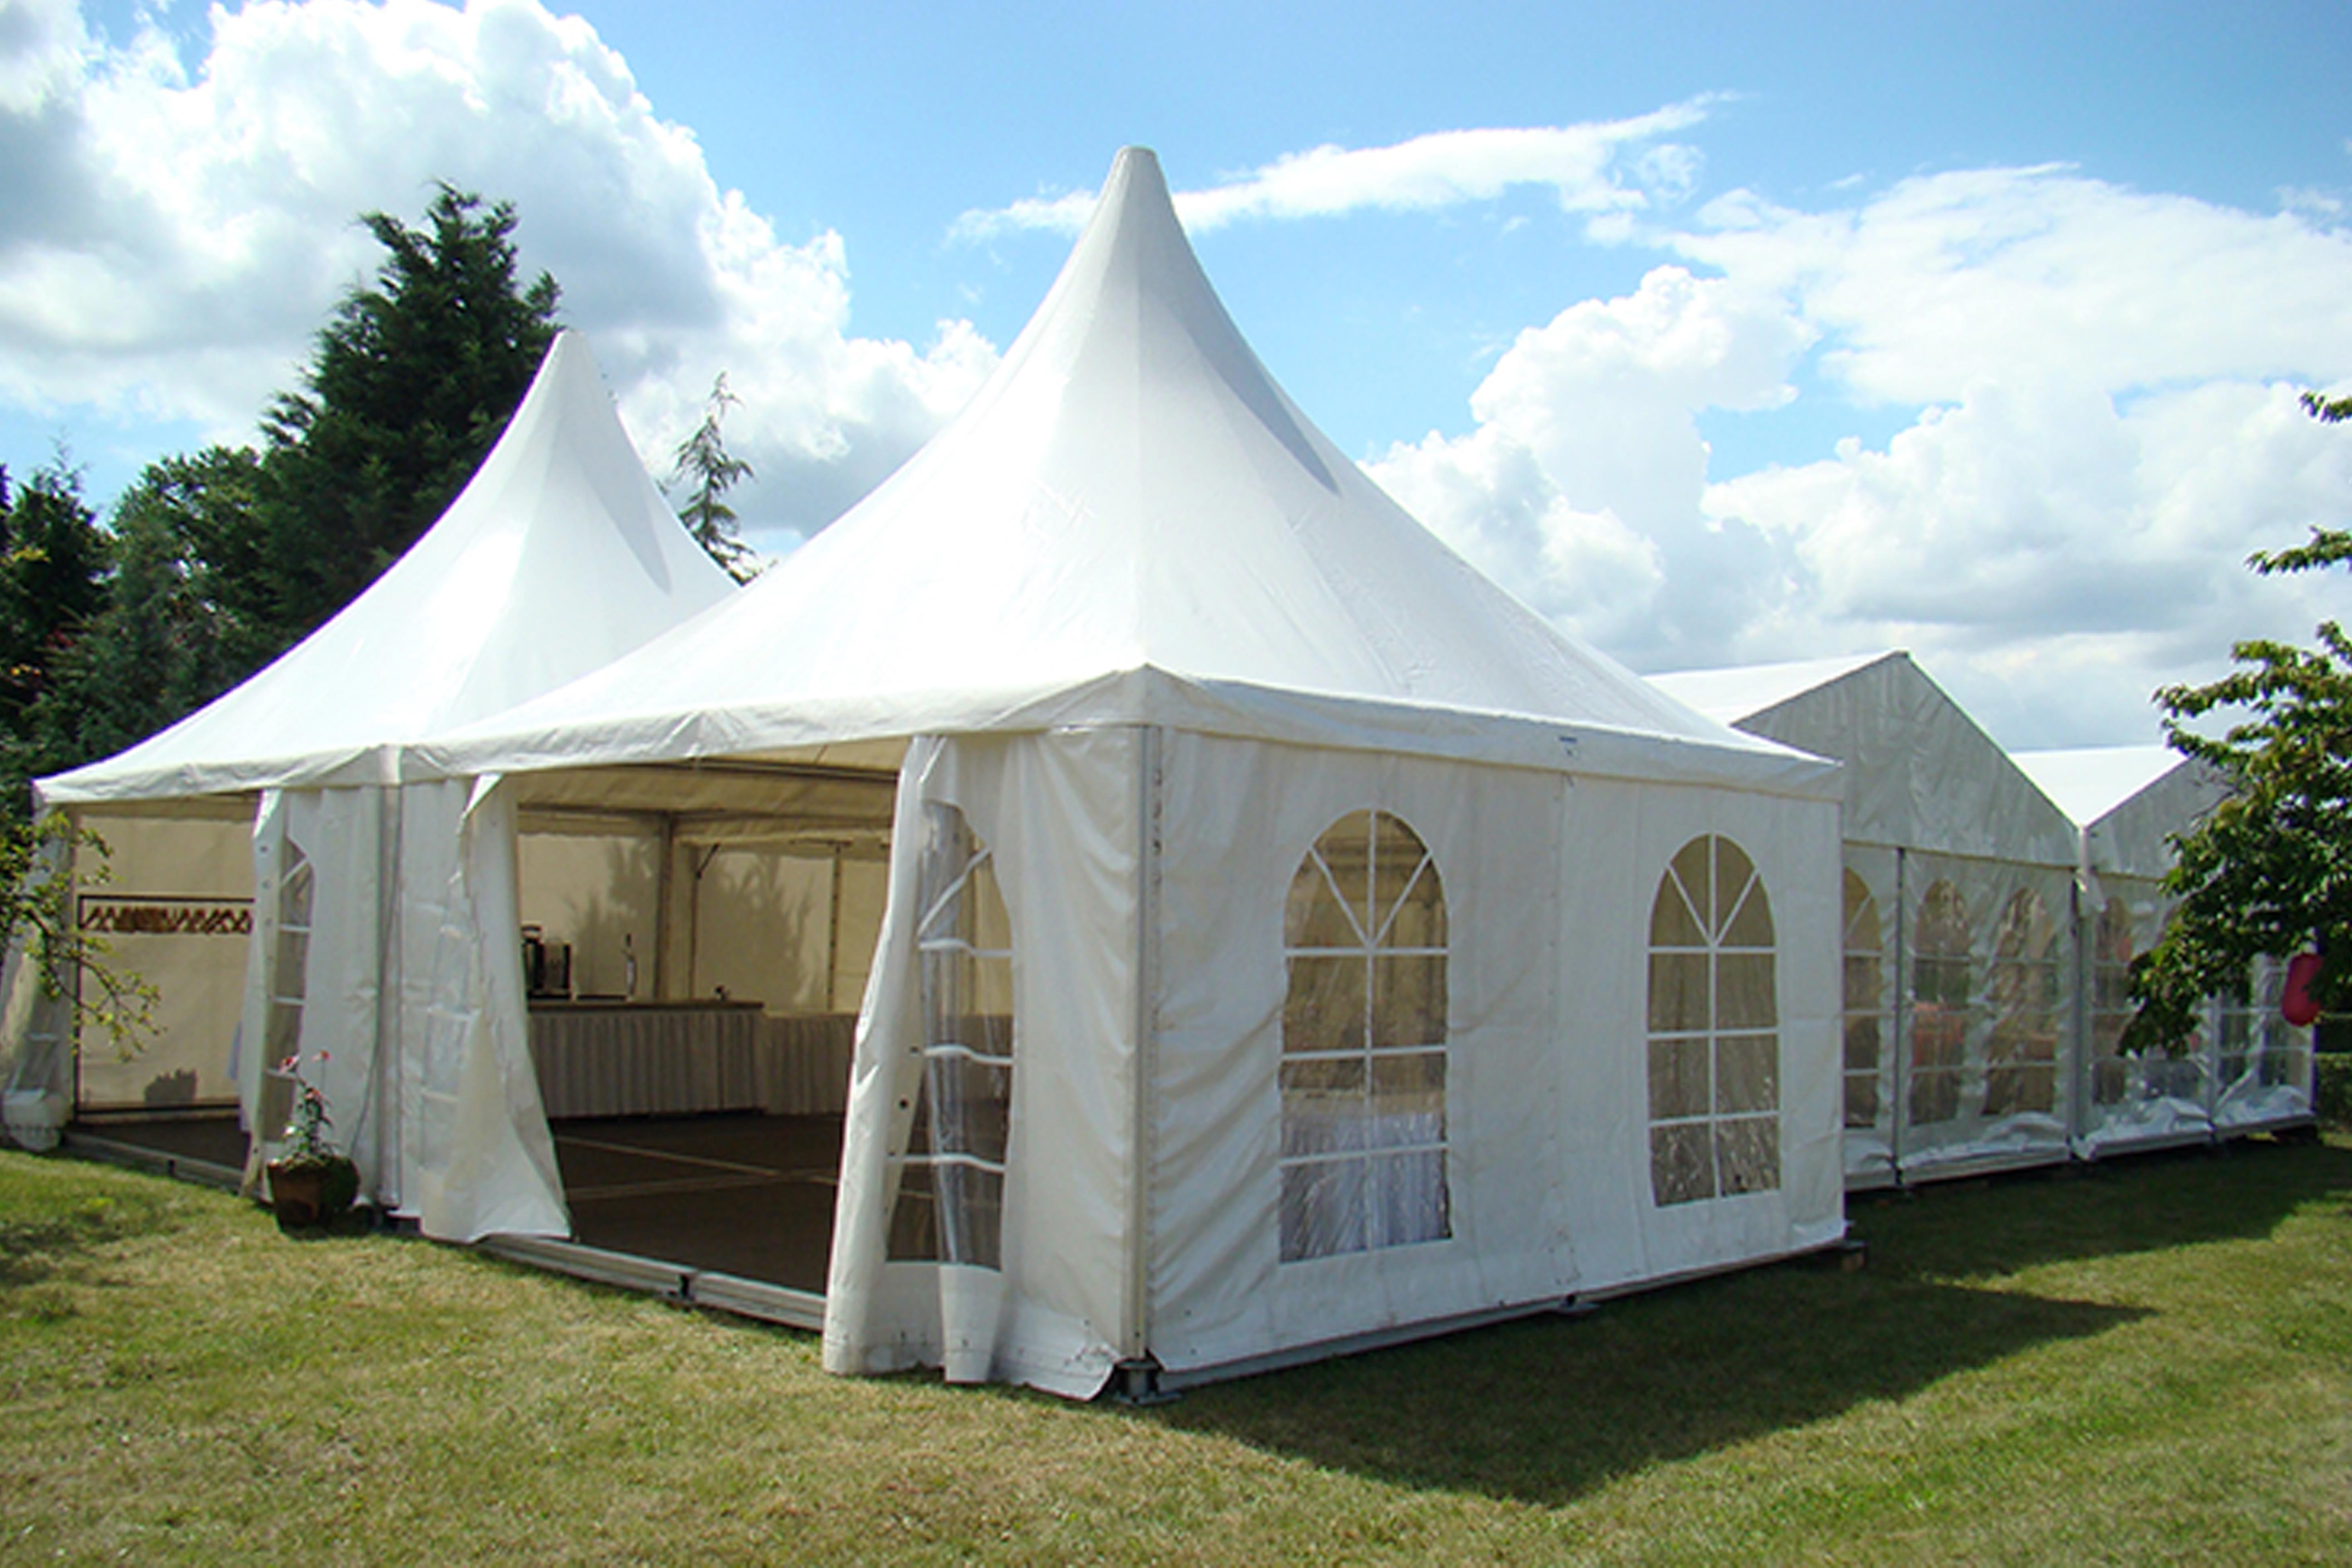 PaCoS-Catering Zelte Ausstattungen